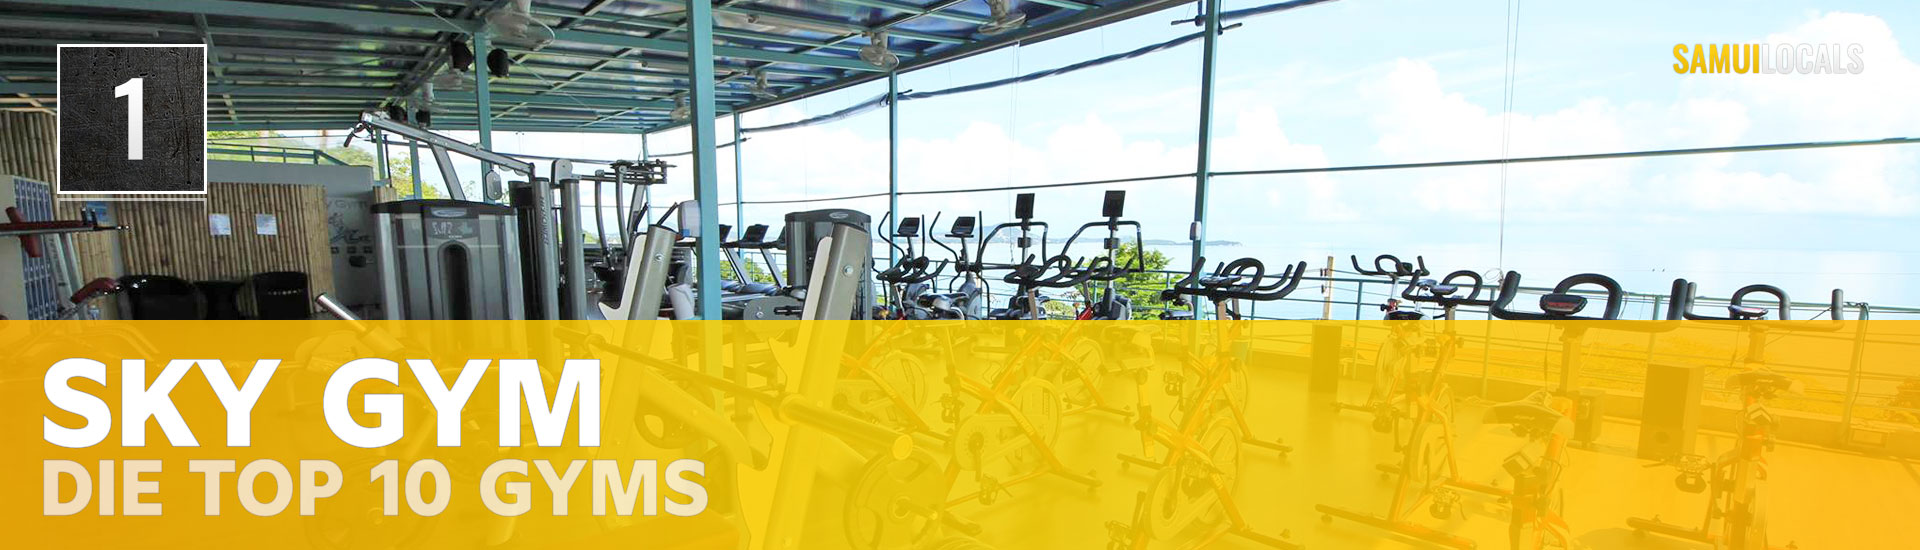 Top_10_gyms_sky_gym